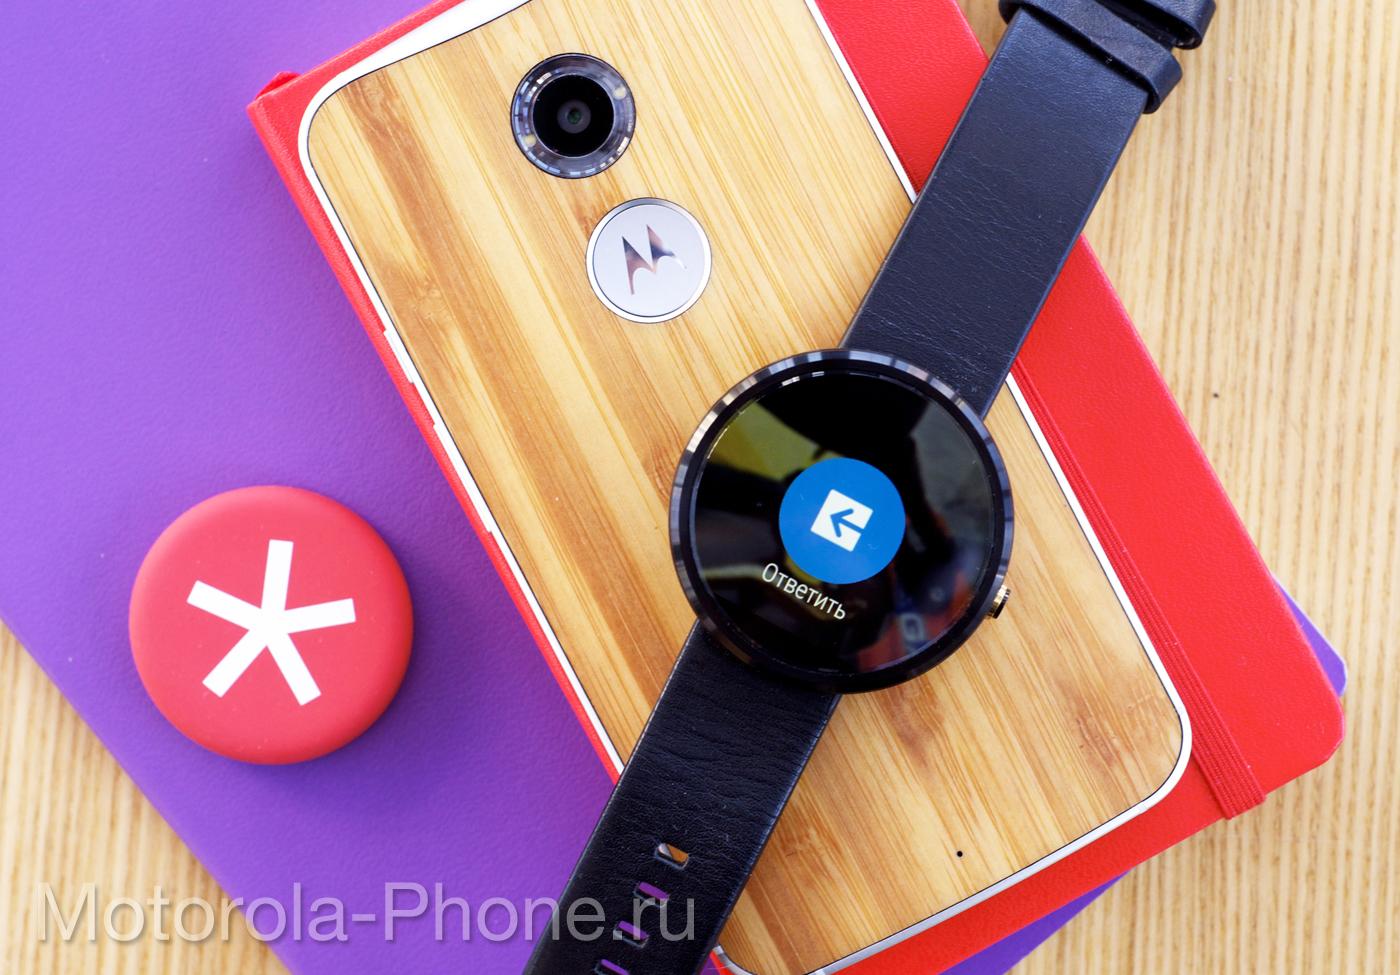 BBM-Android-Wear-Moto-04